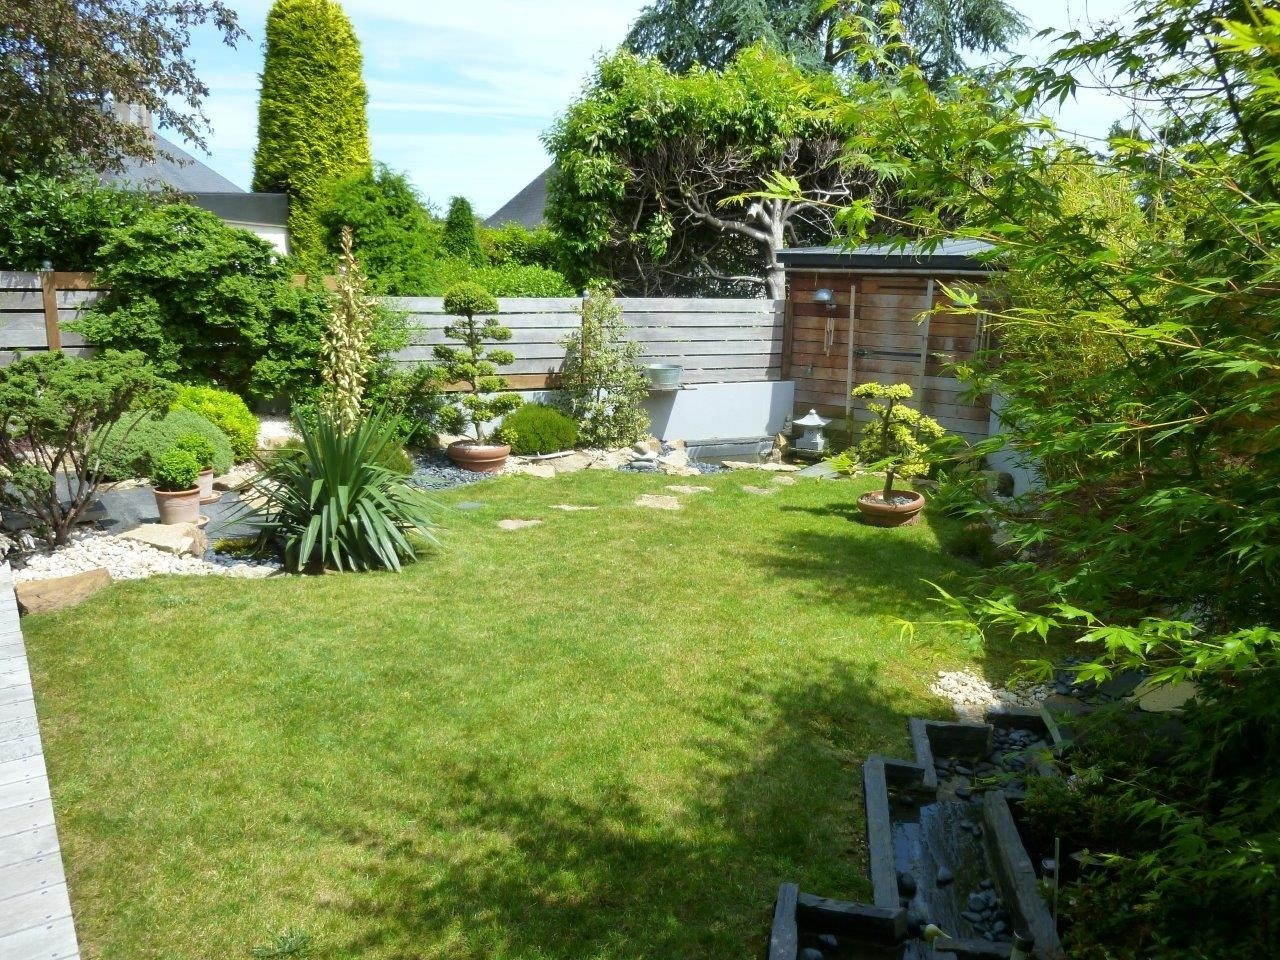 Idee Amenagement Petit Jardin Concept - Idees Conception Jardin avec Aménagement D Un Petit Jardin De Ville